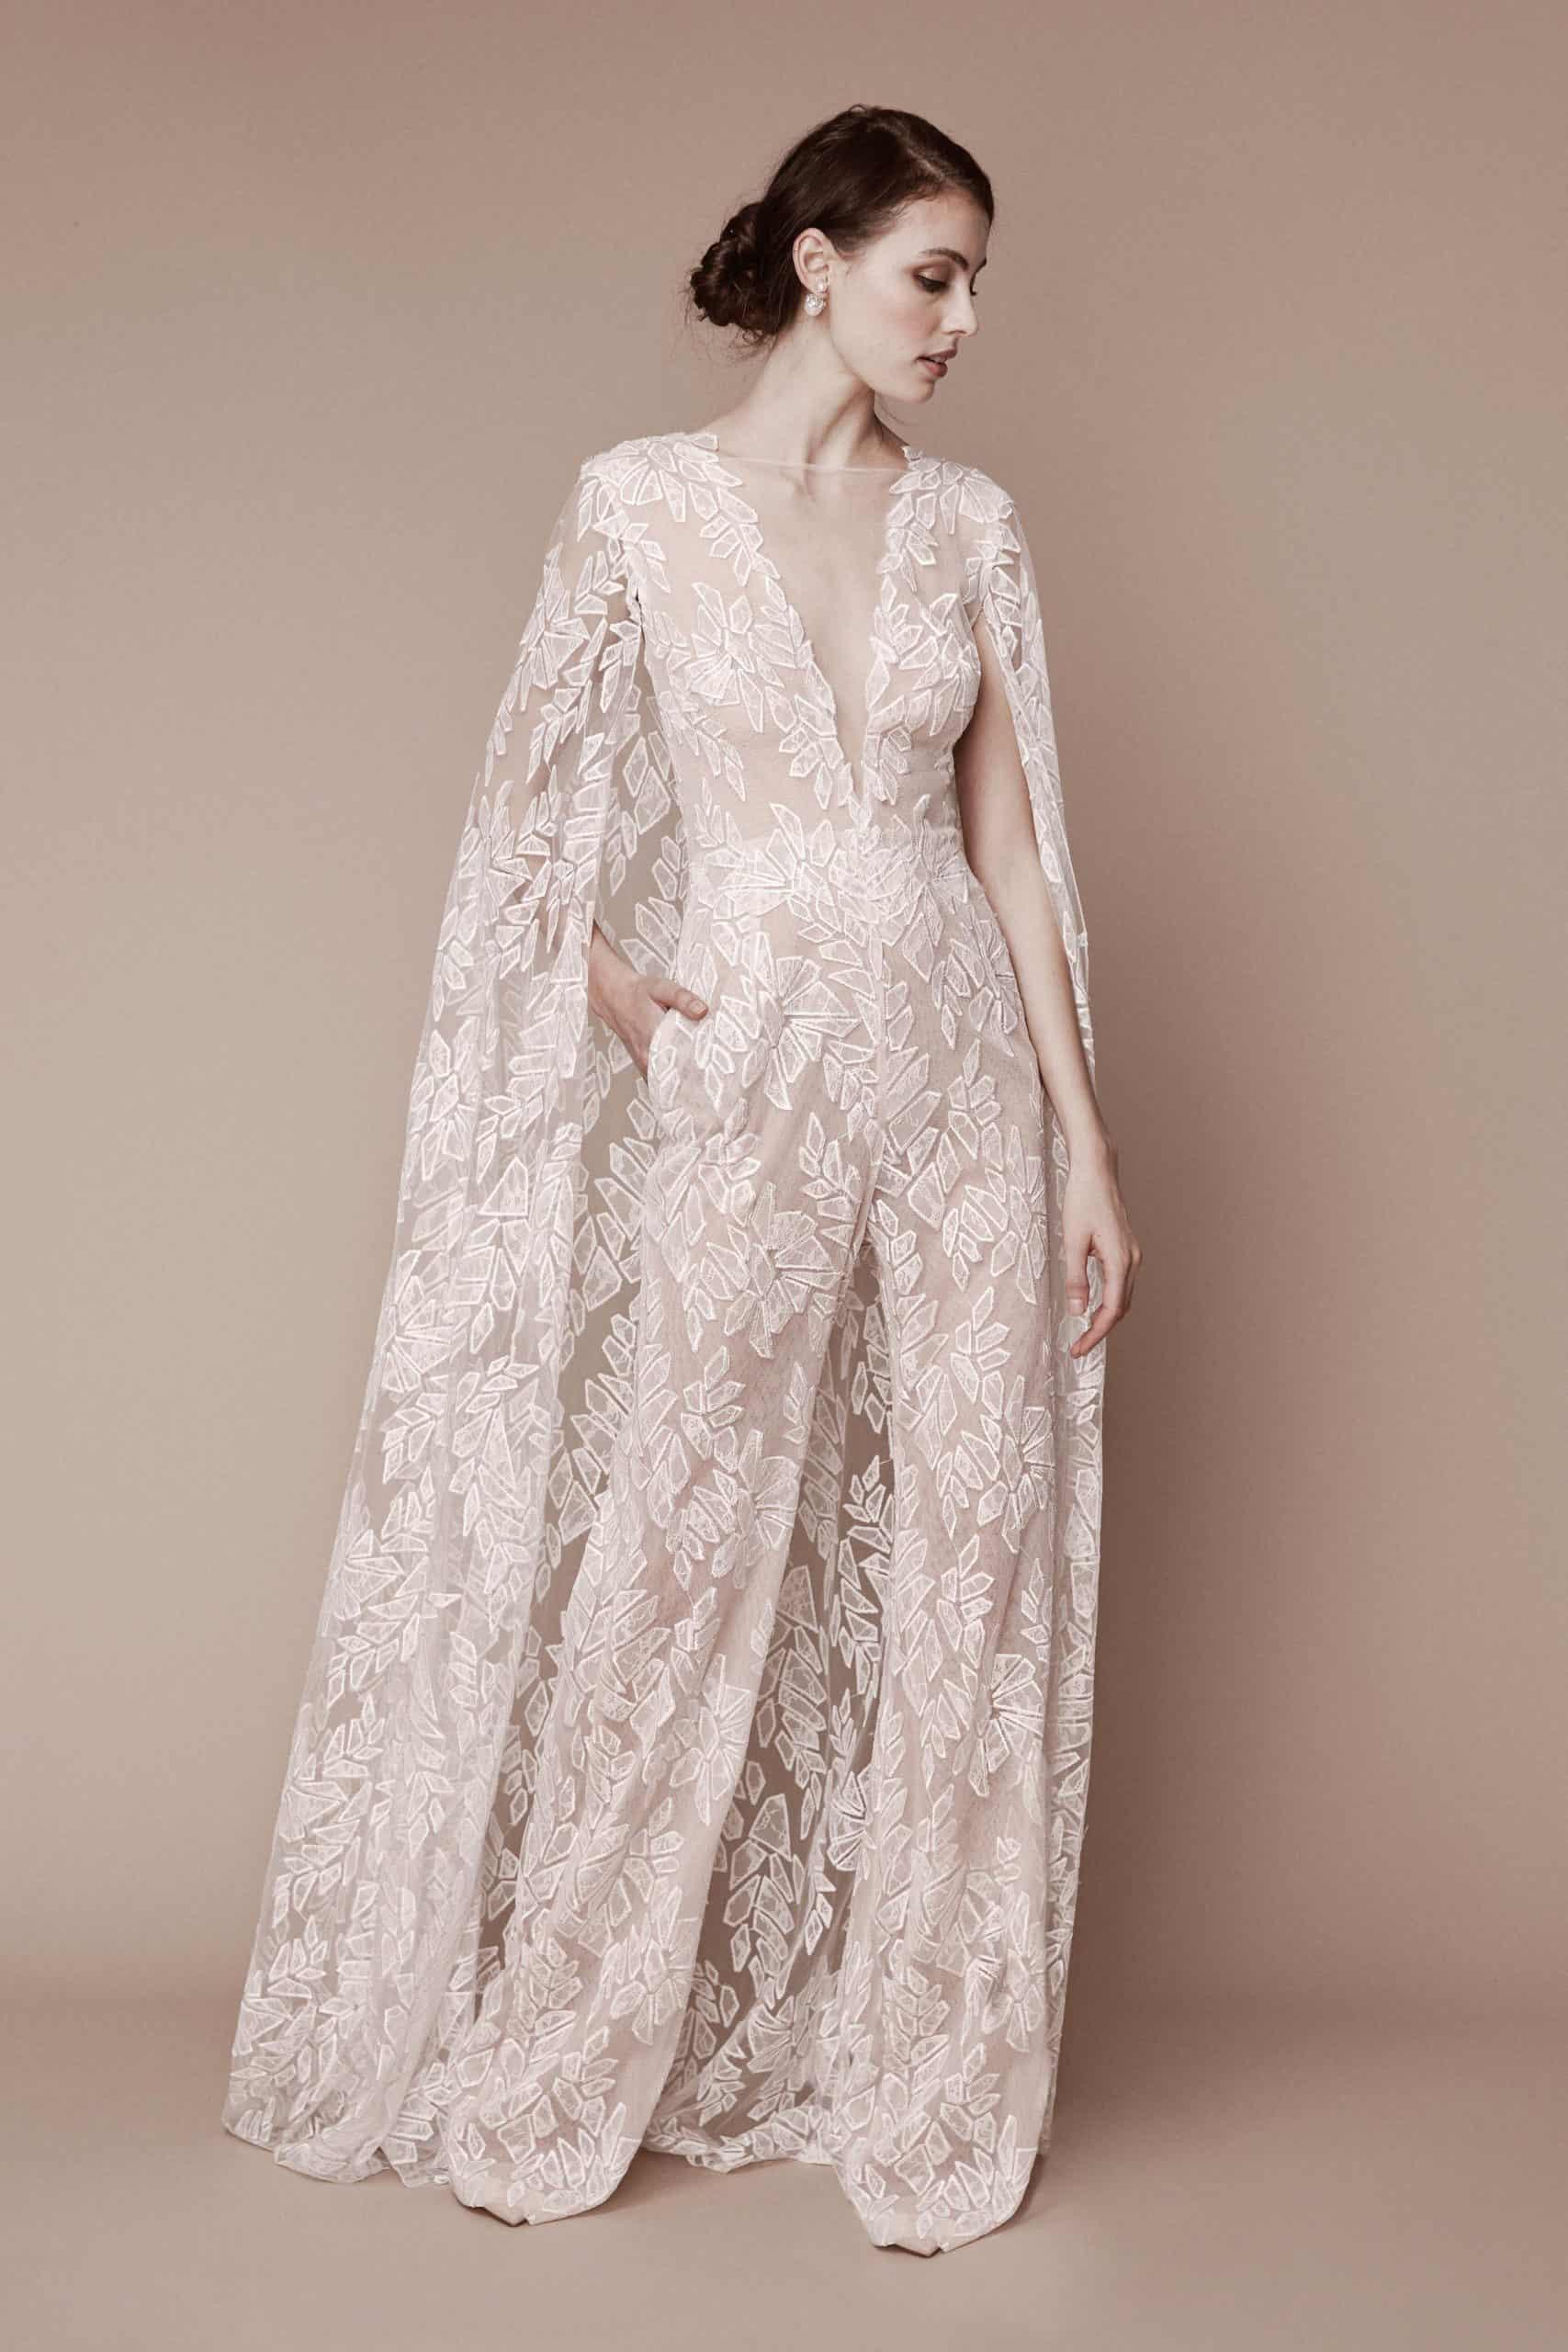 jumpsuit wedding dress collection fall 2019 by Tadashi Shoji